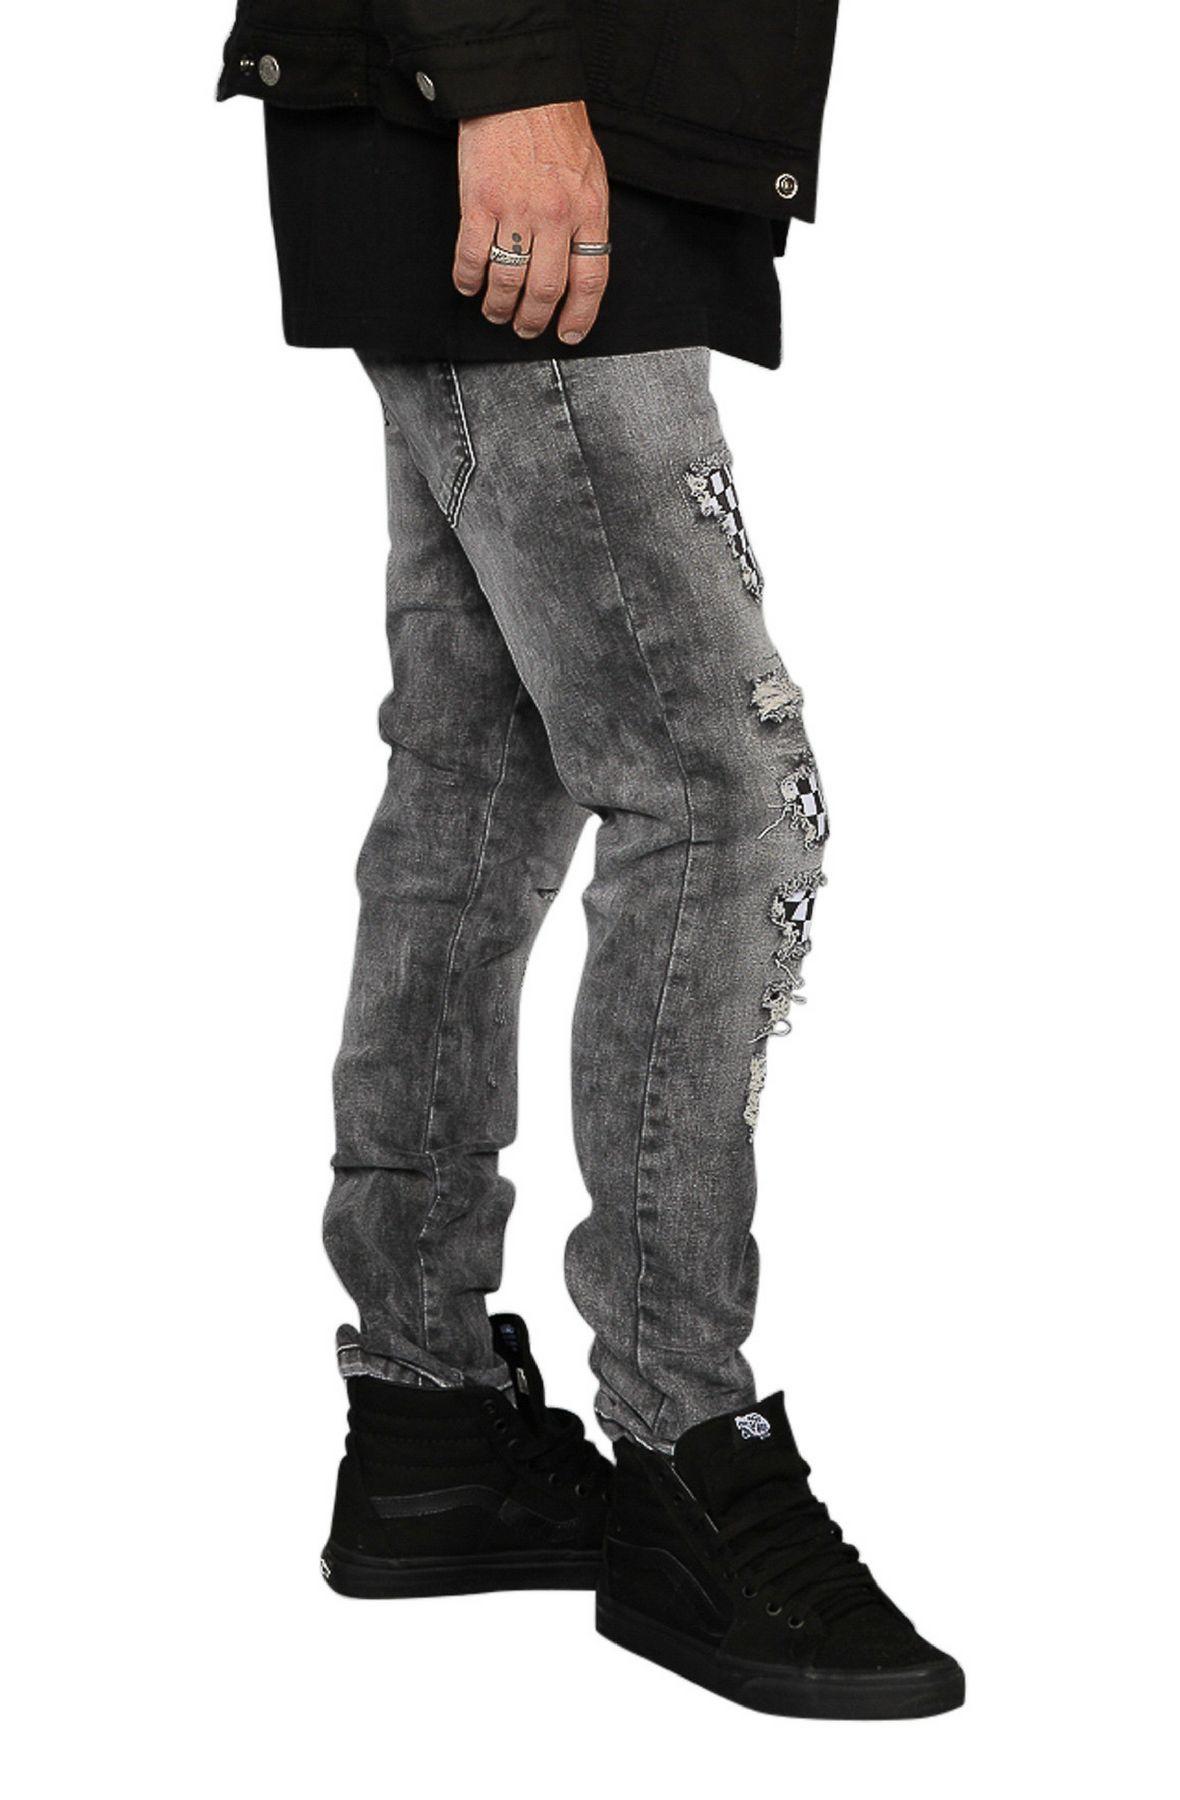 Image of The Seena Distressed Skinny Jeans in Black